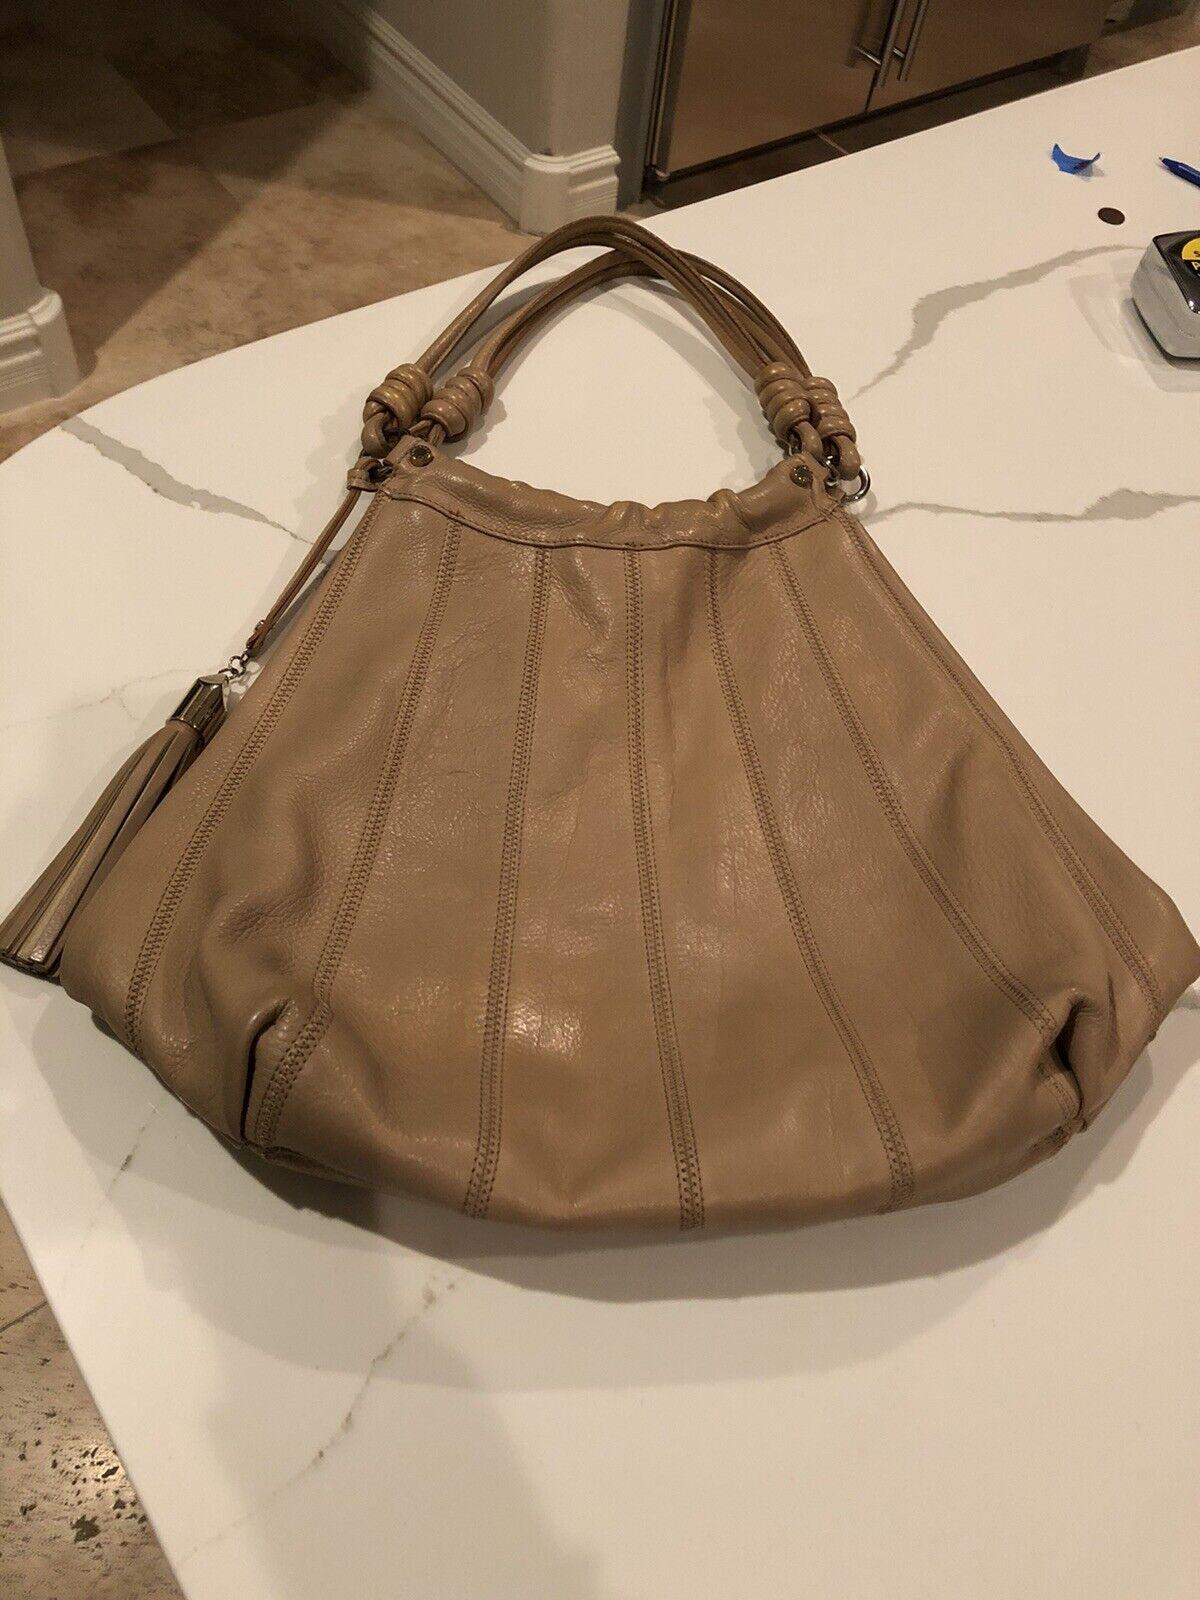 Stuart Weitzman Leather Purse Handbag Gorgeous!!!